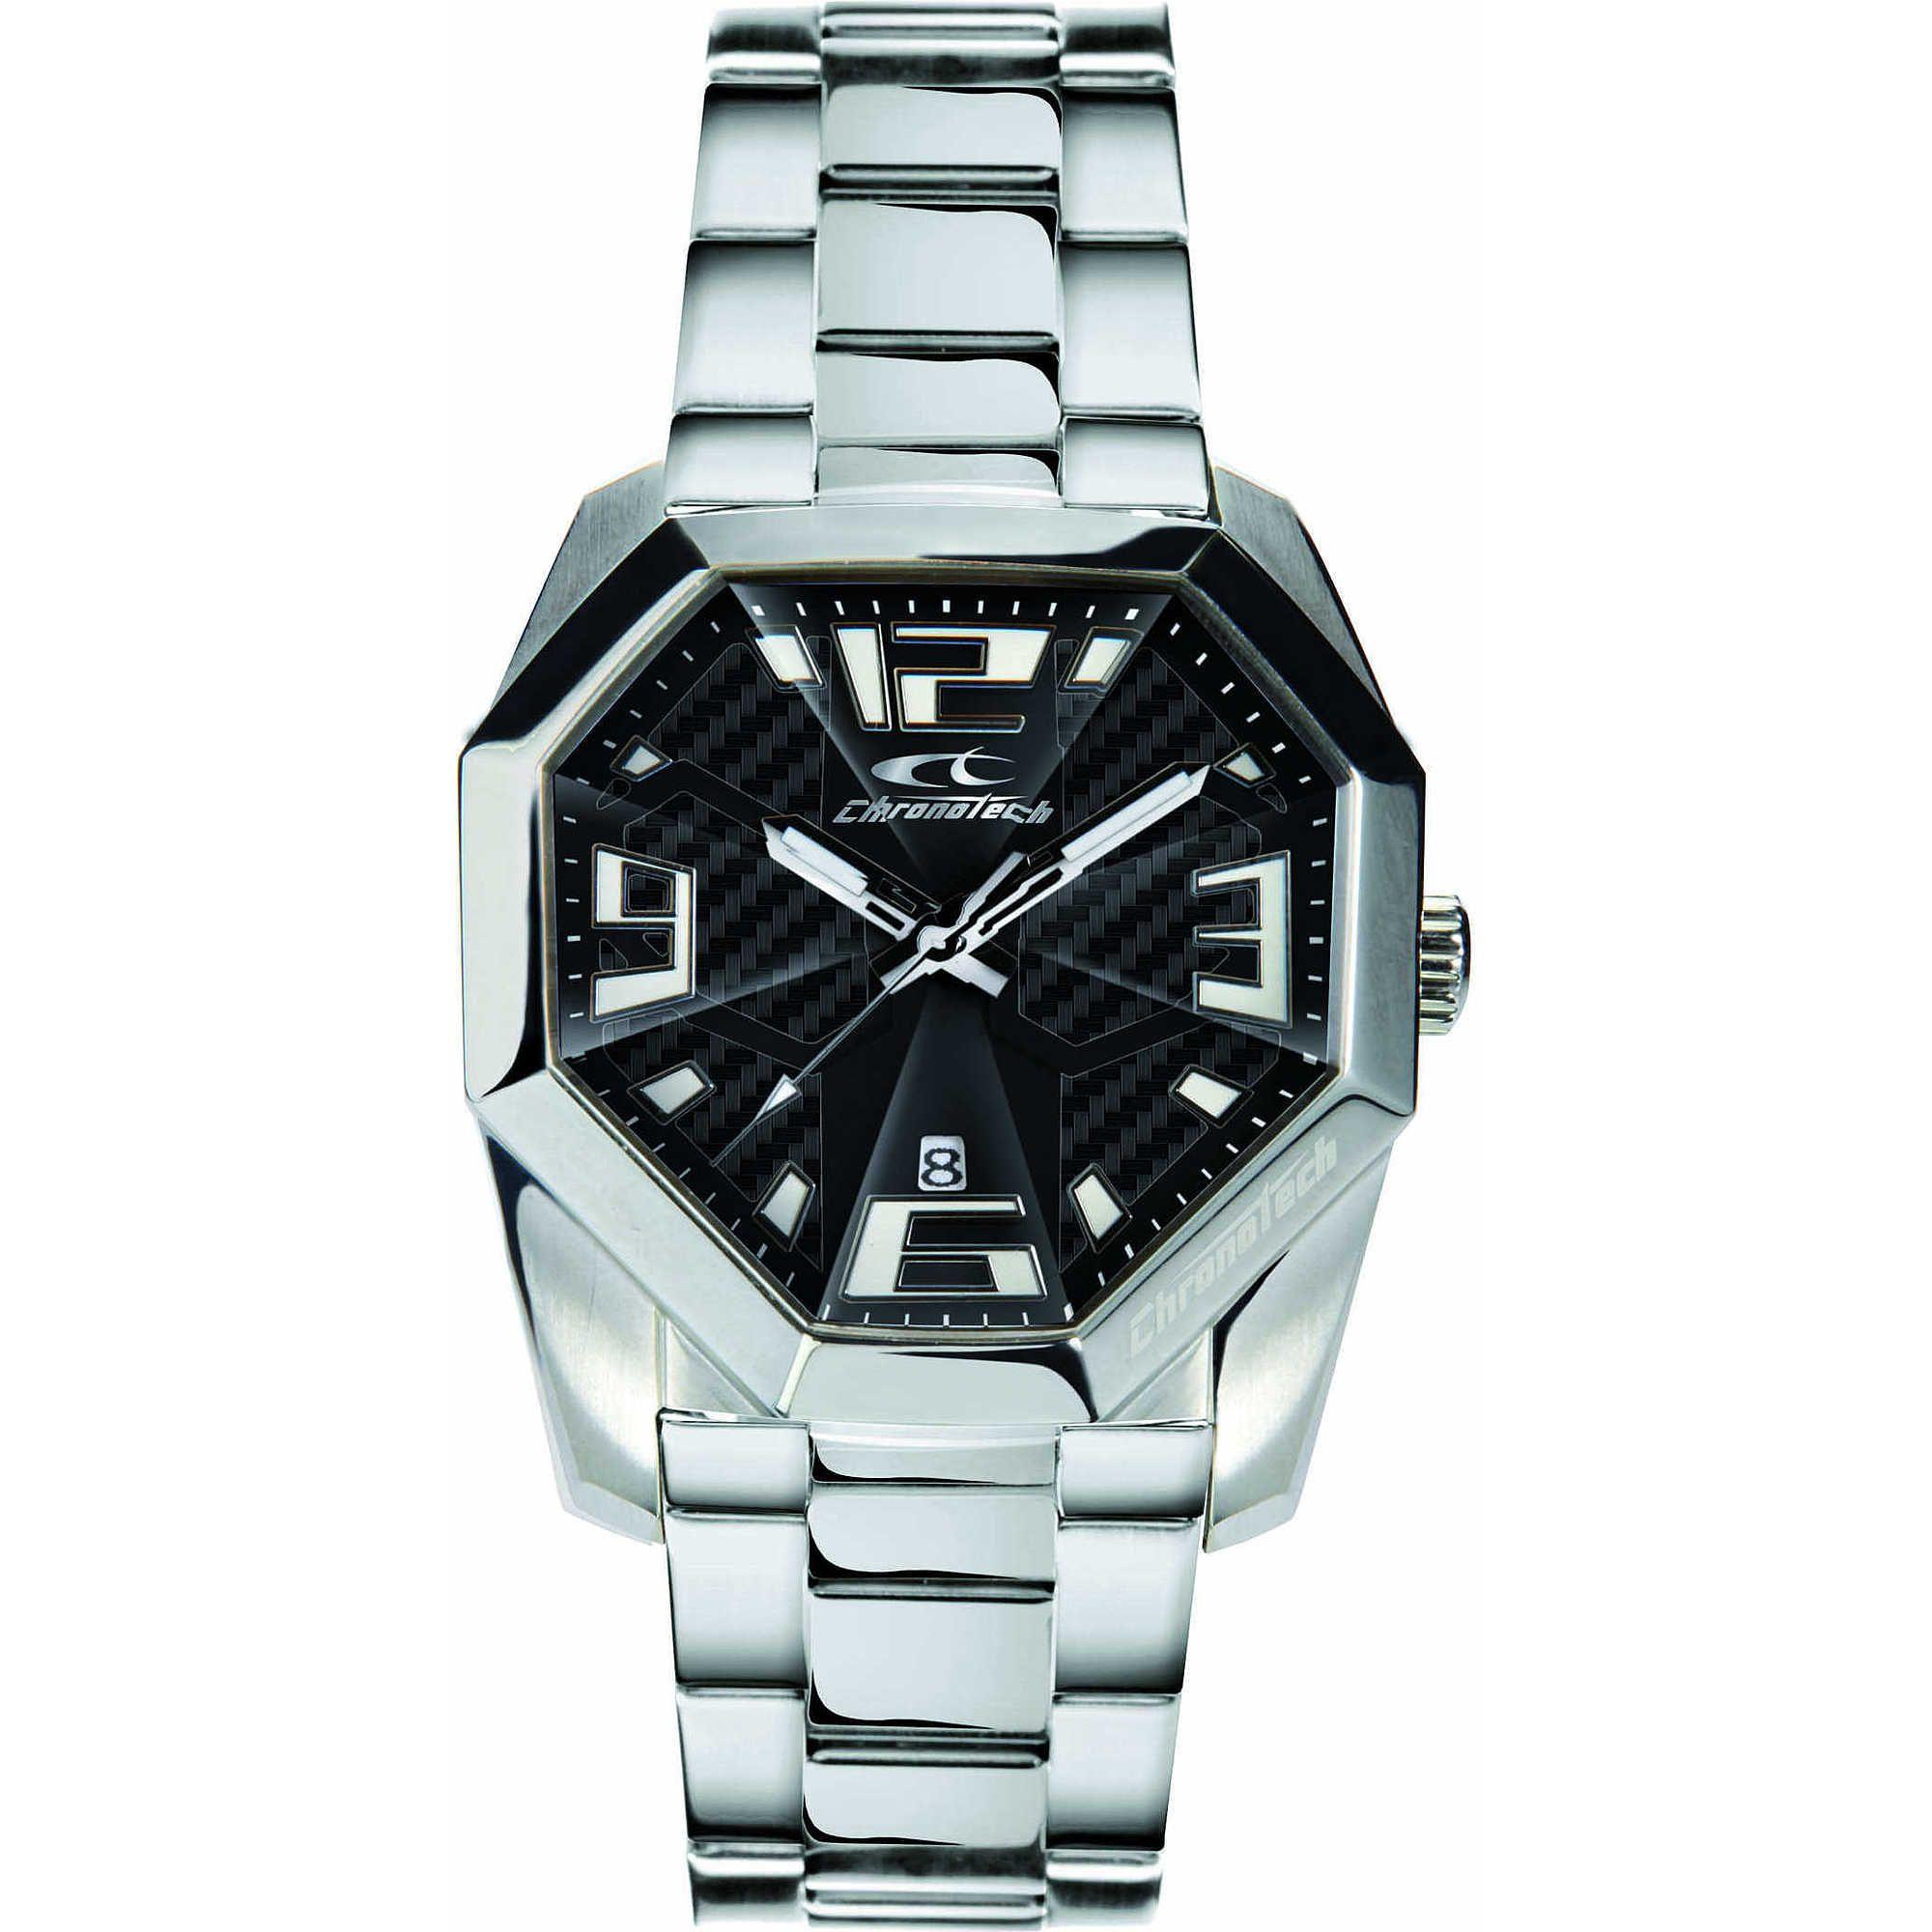 Orologio uomo Chronotech RW0083